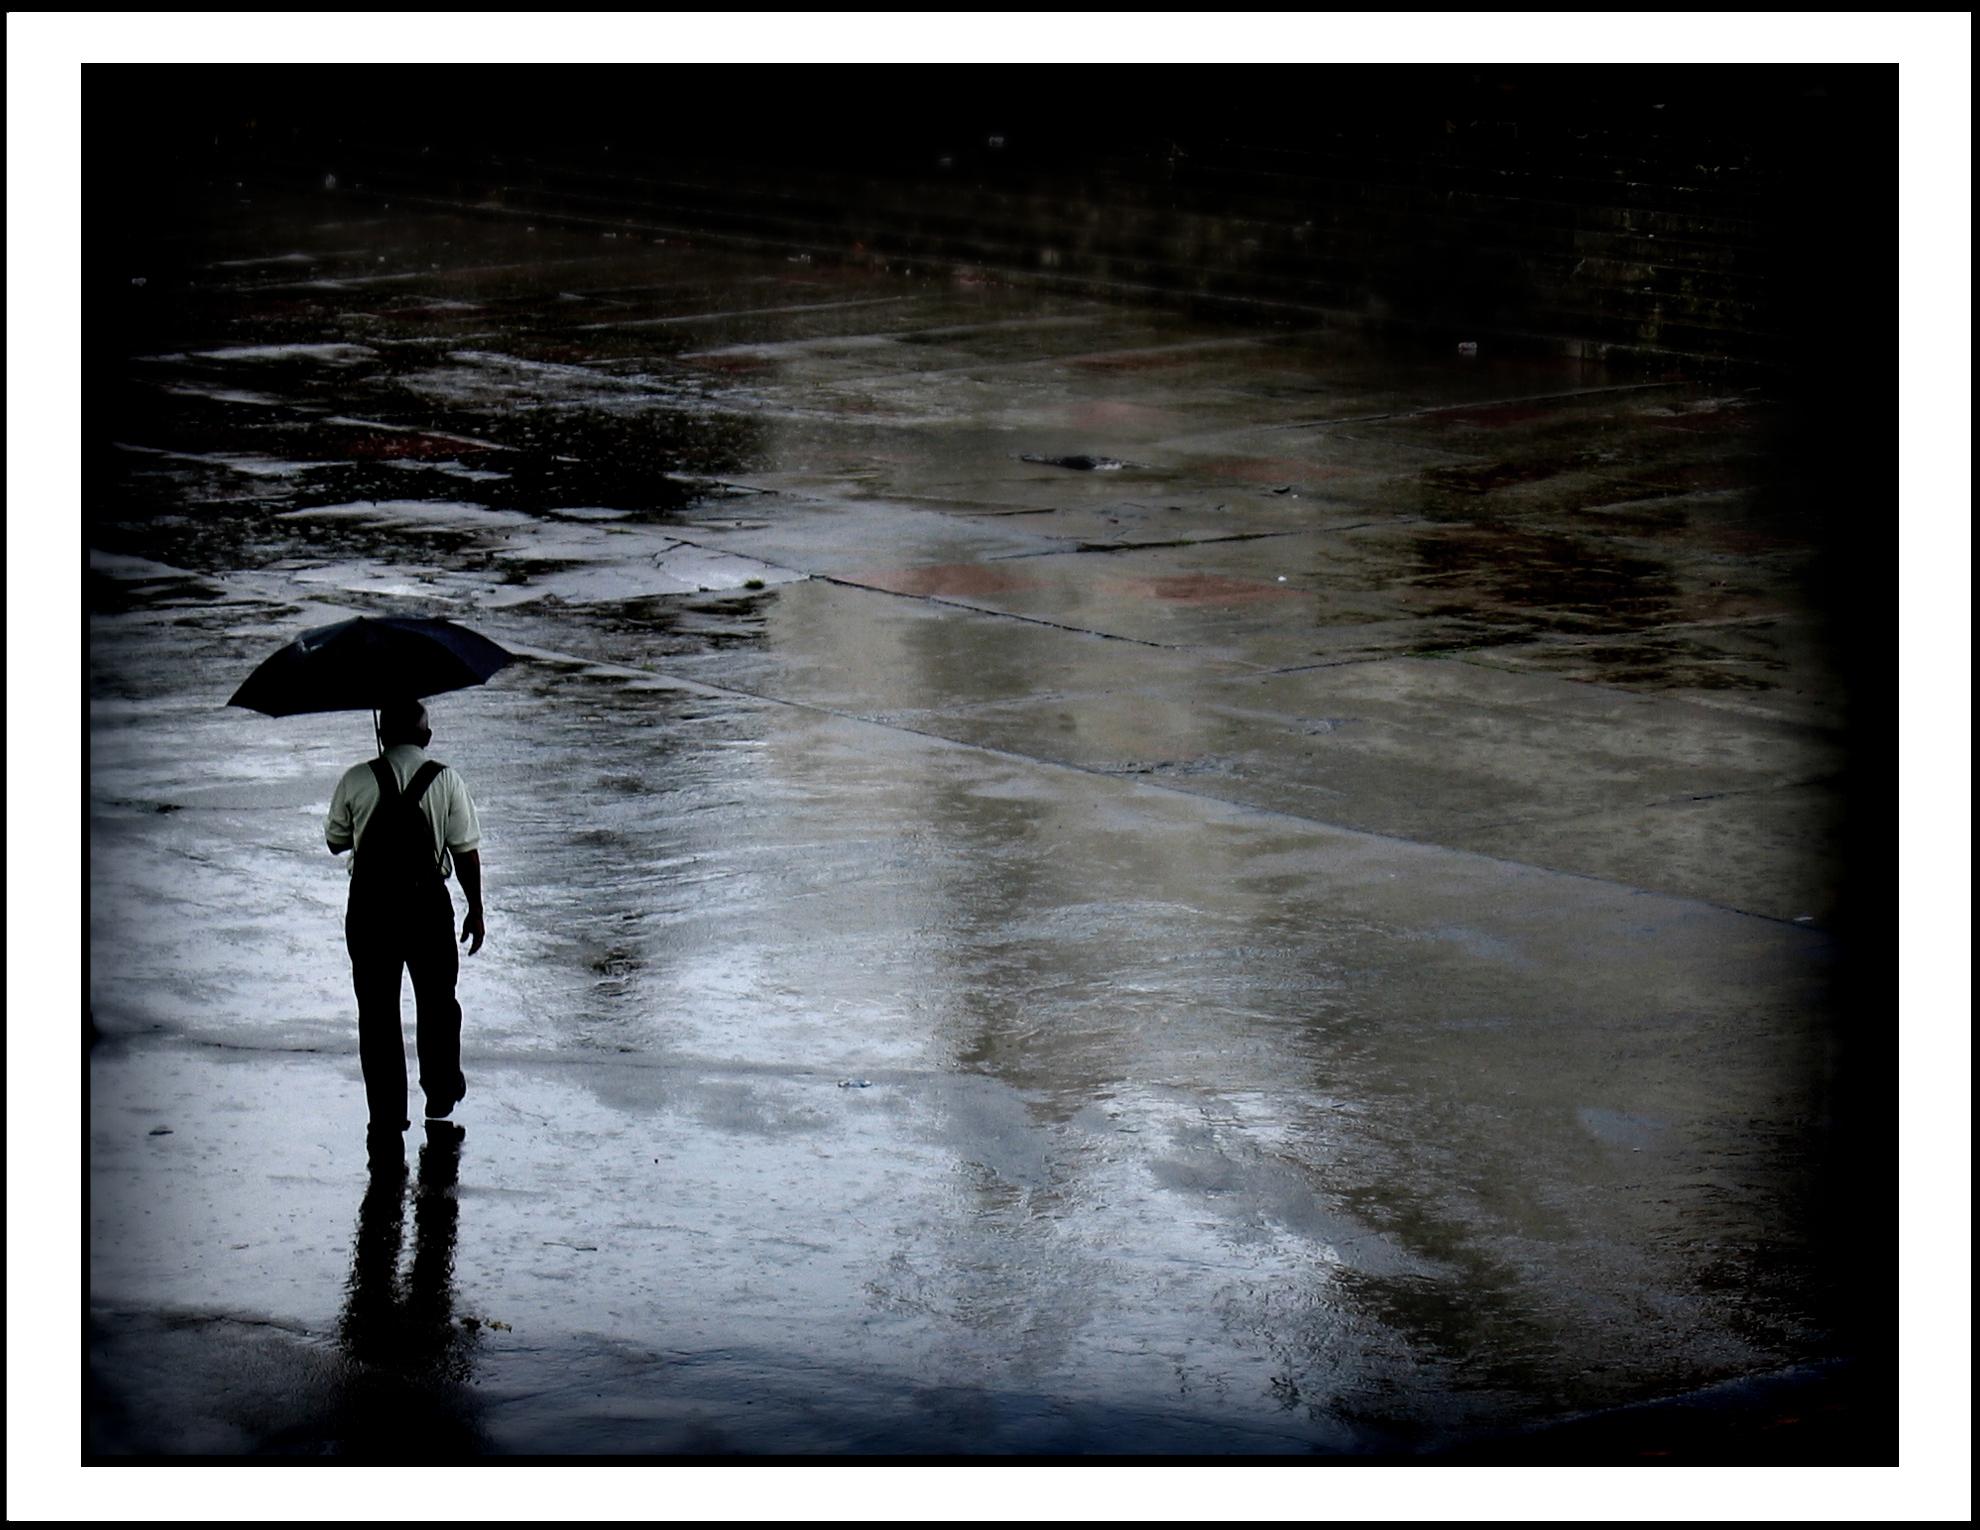 Rain (Liberia, Guanacaste, Costa Rica). CC2.0 photo by NannyDaddy.